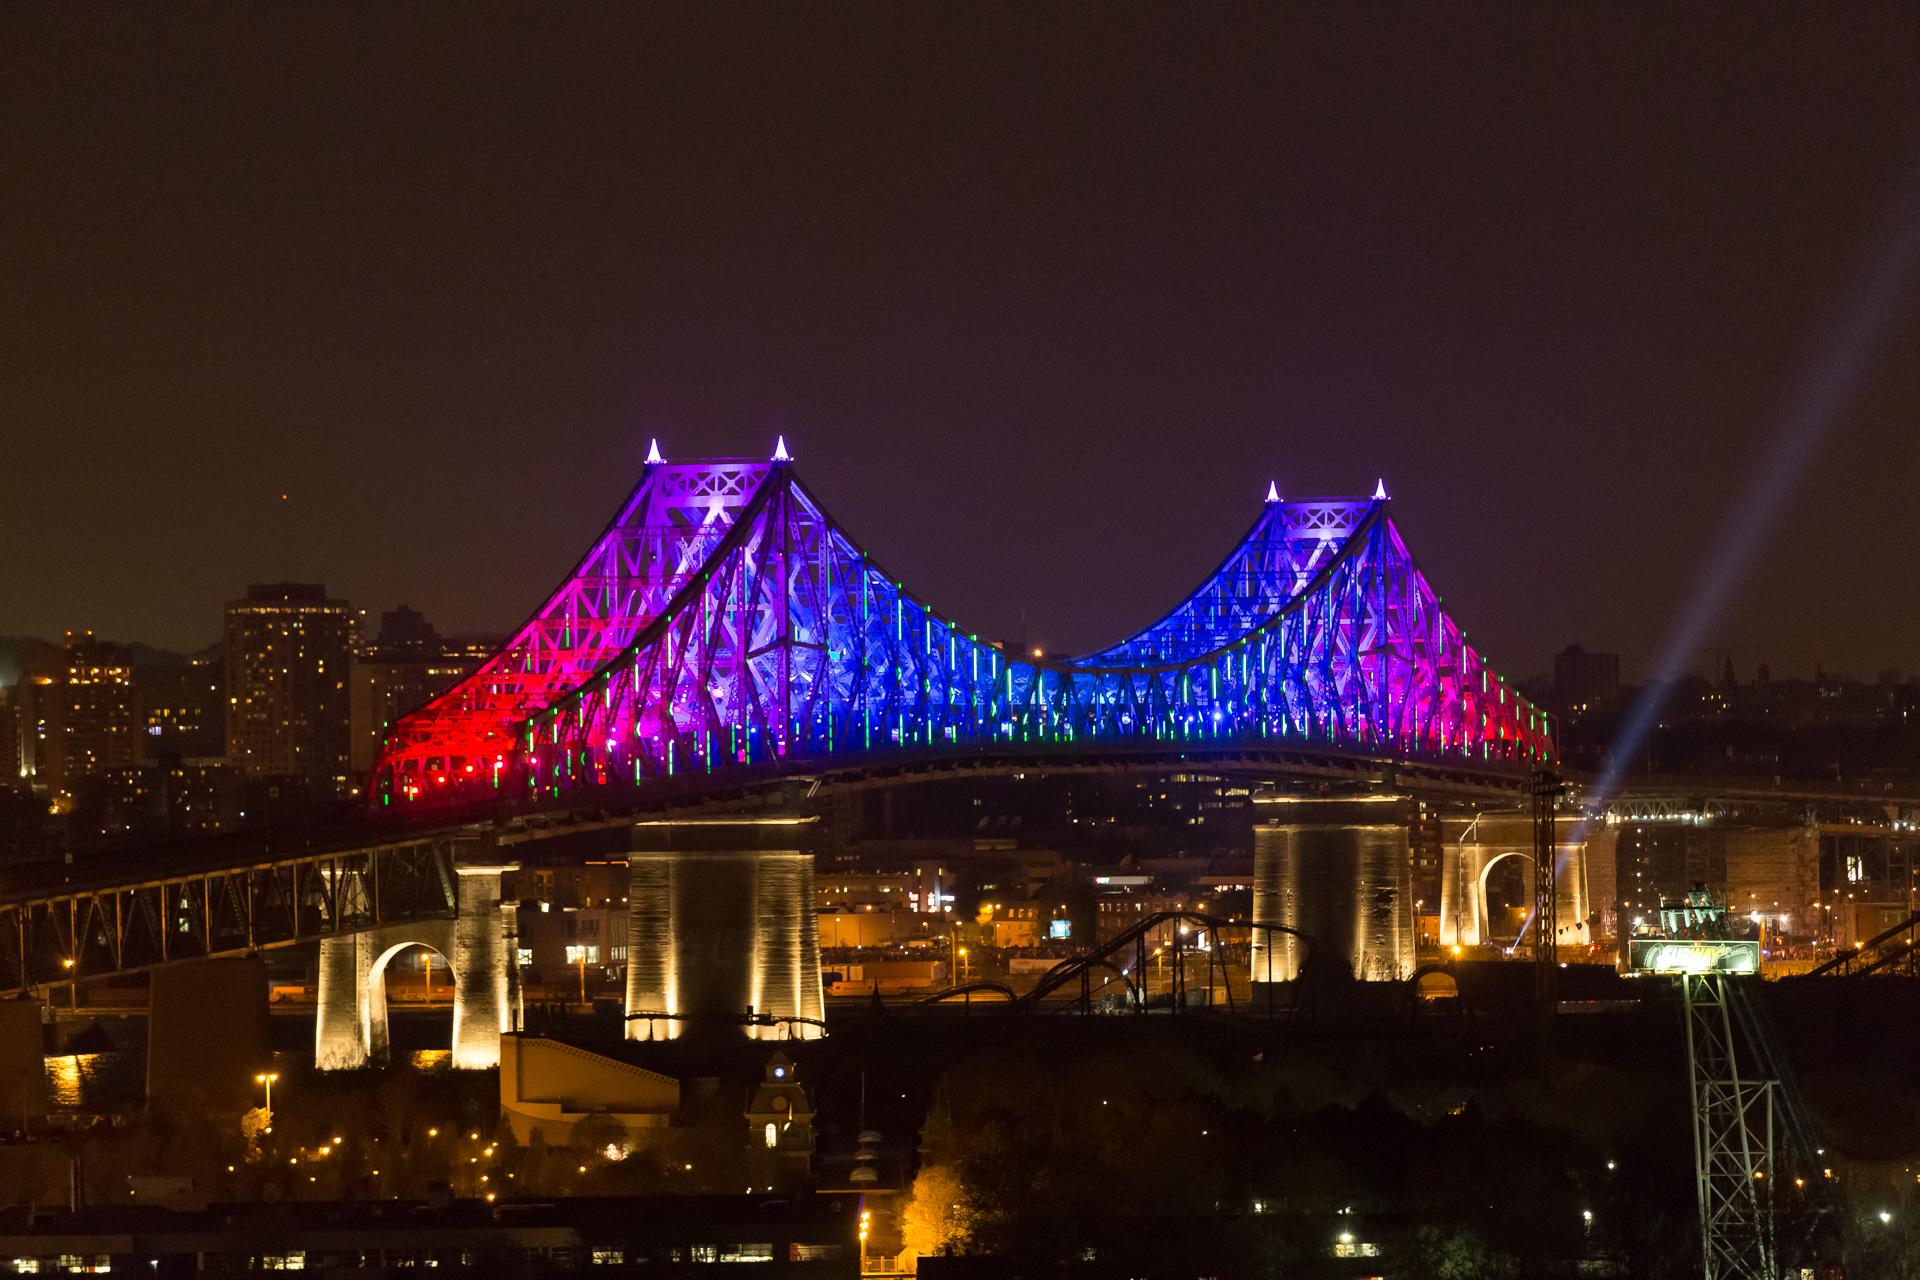 Montreal bridge changing colors 3